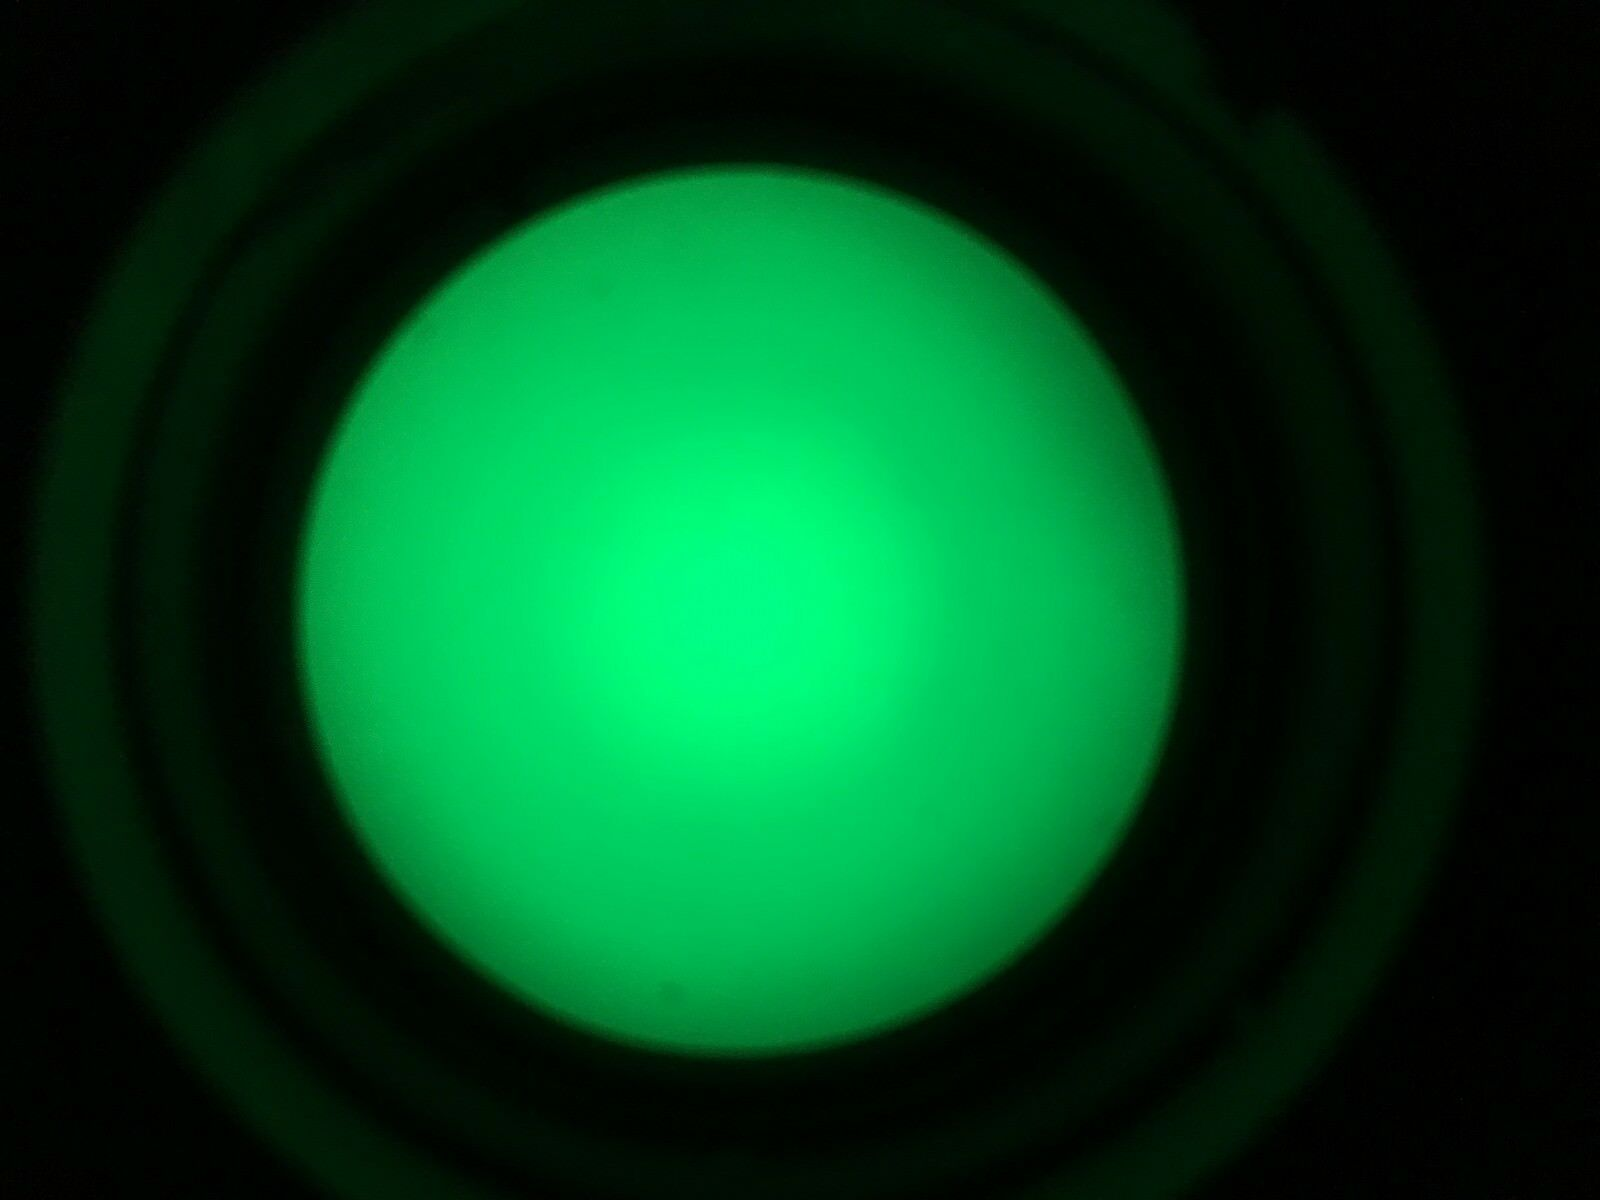 Vehículo ecológico mejorado Visión Nocturna intensificador de imagen  P8079HP cascada de grado A